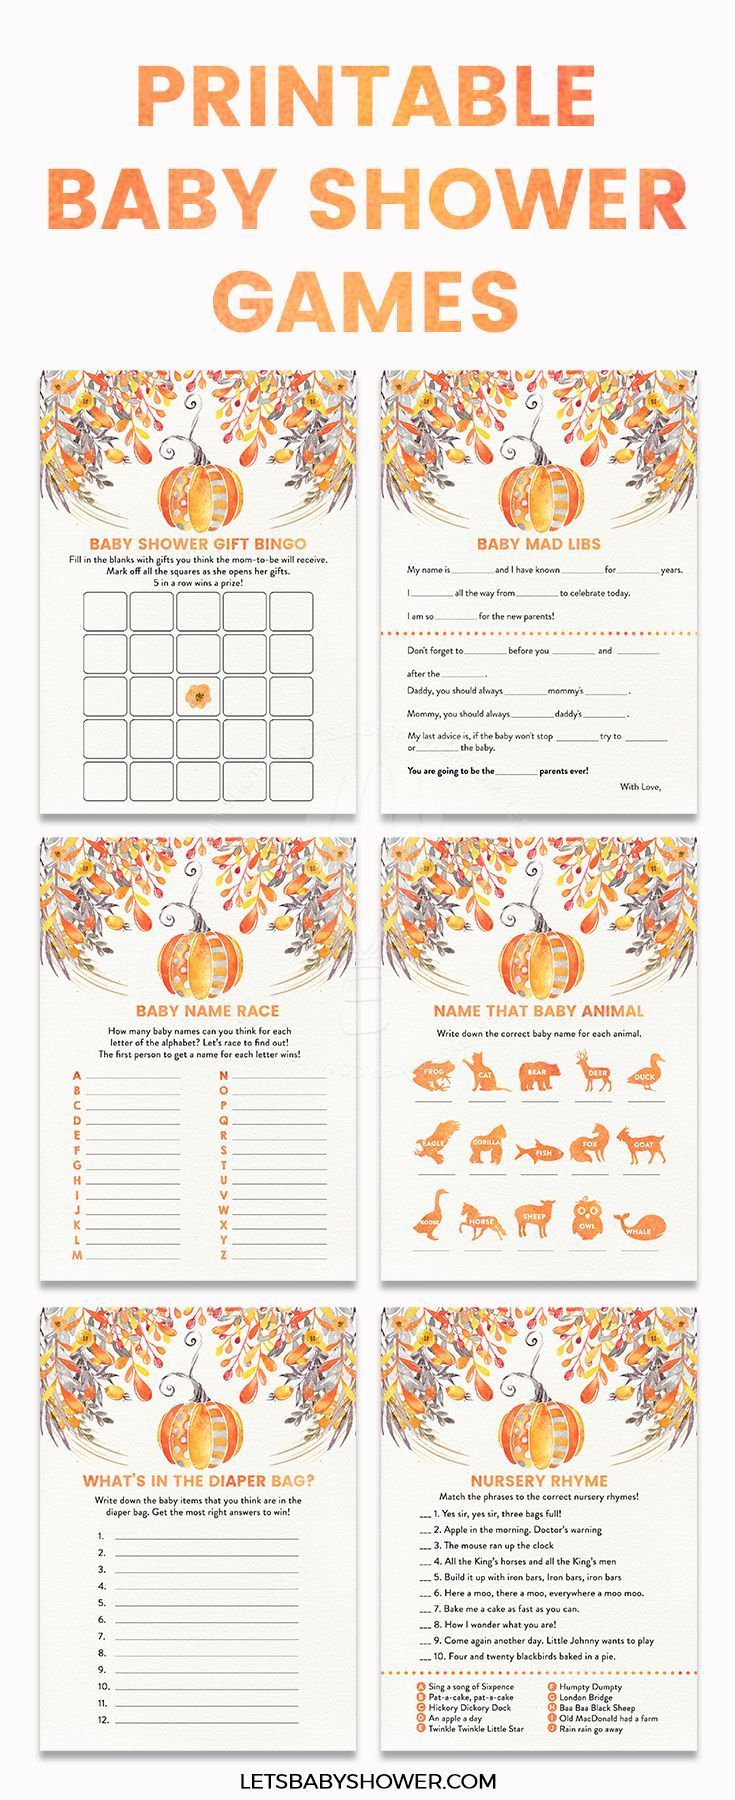 Printable Baby Shower: Fall Autumn Orange Pumpkin Baby Shower Idea for Boy or Girl